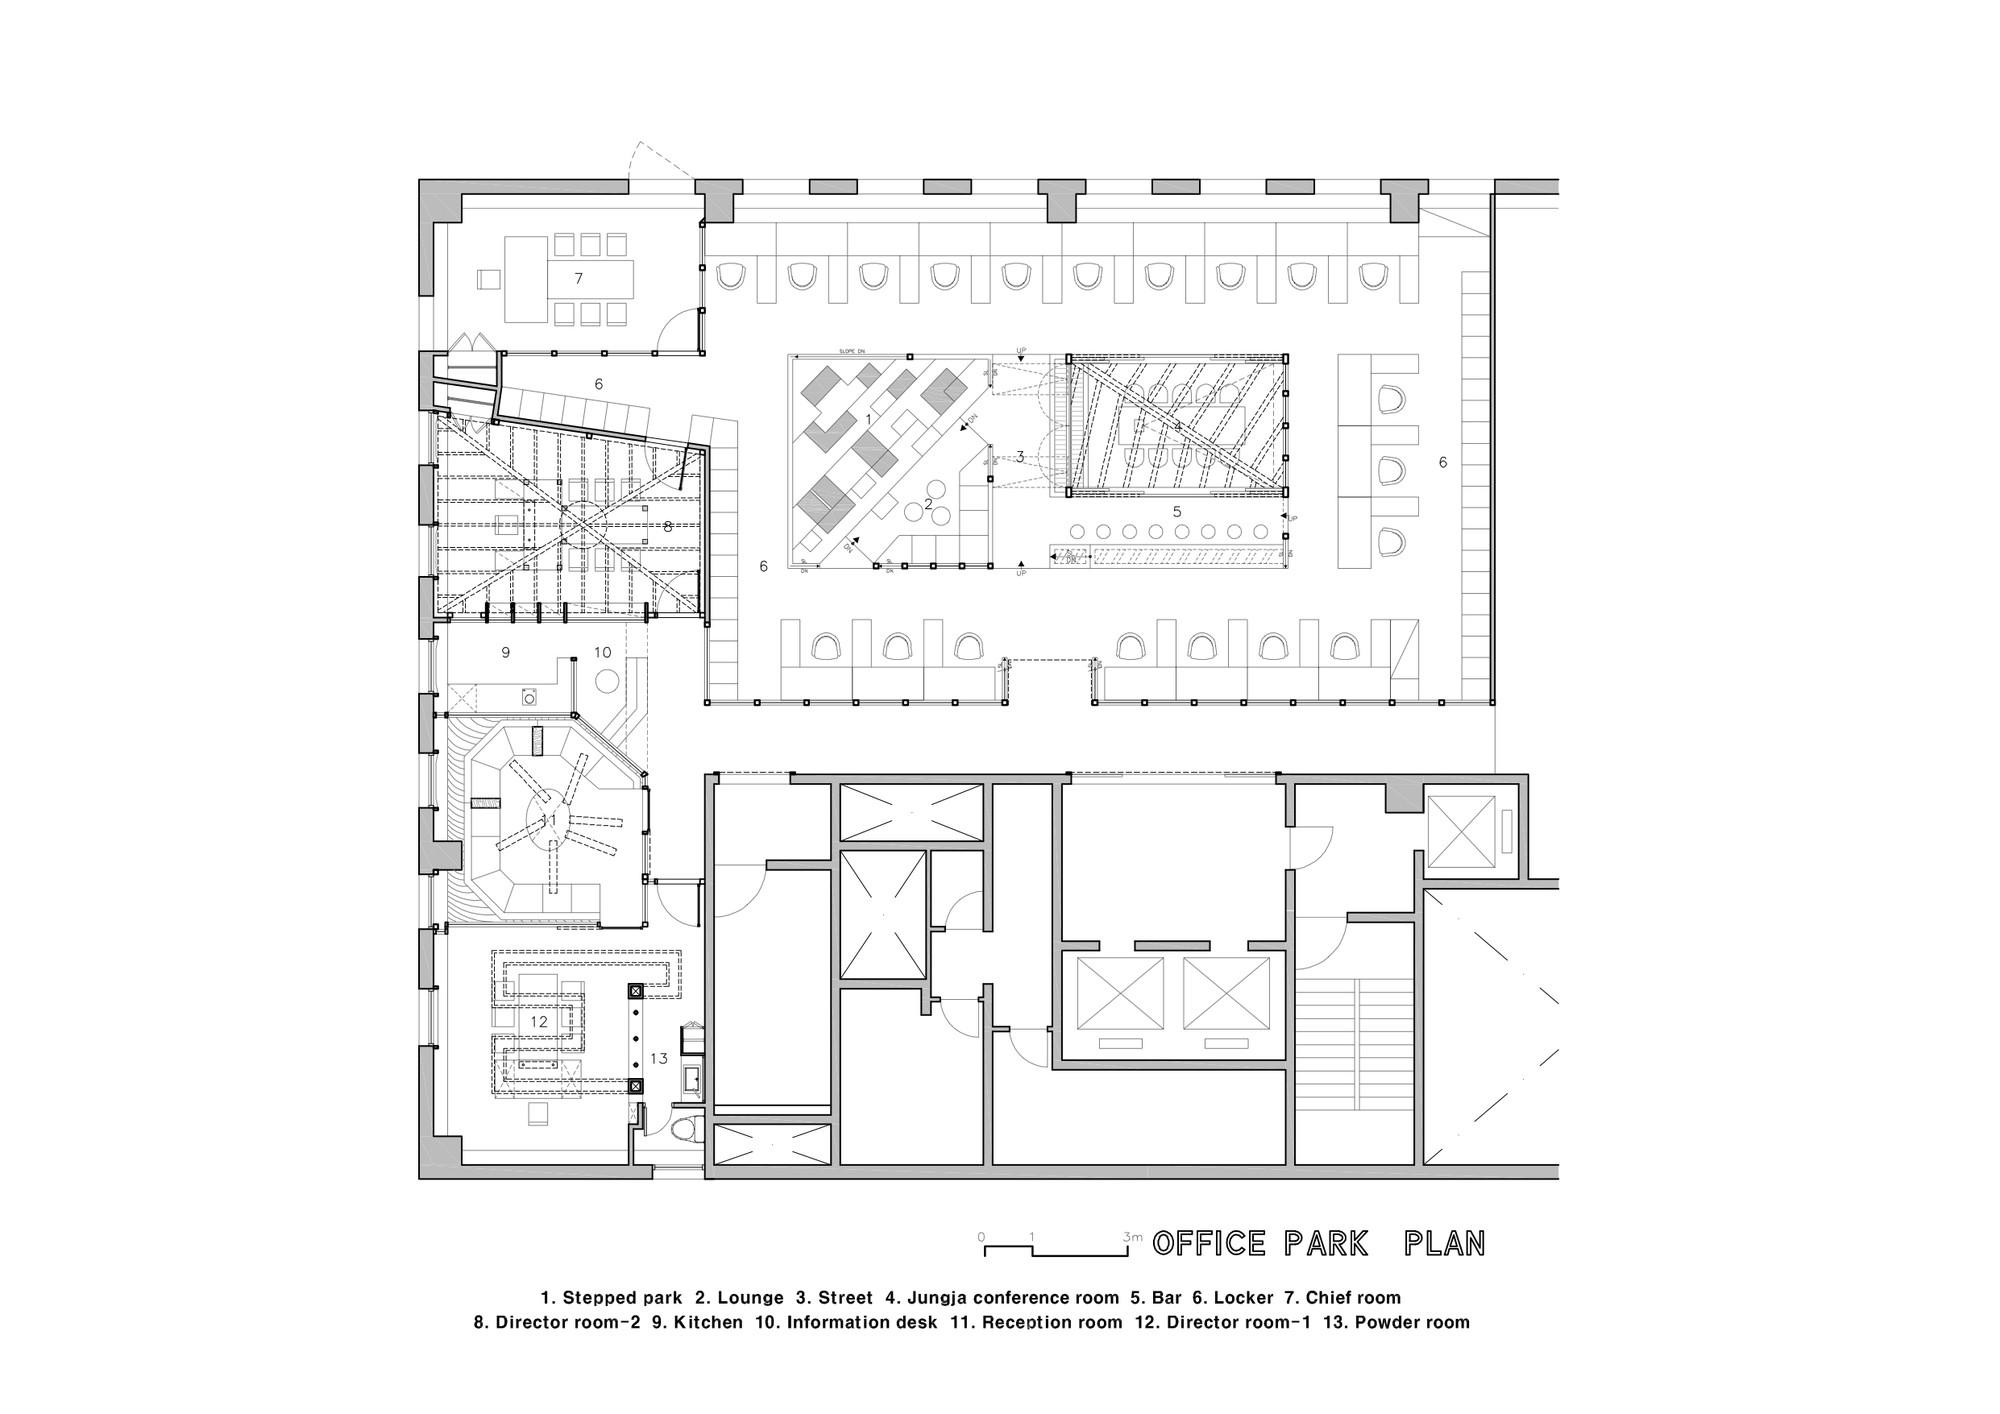 How To Design Office Floor Plans